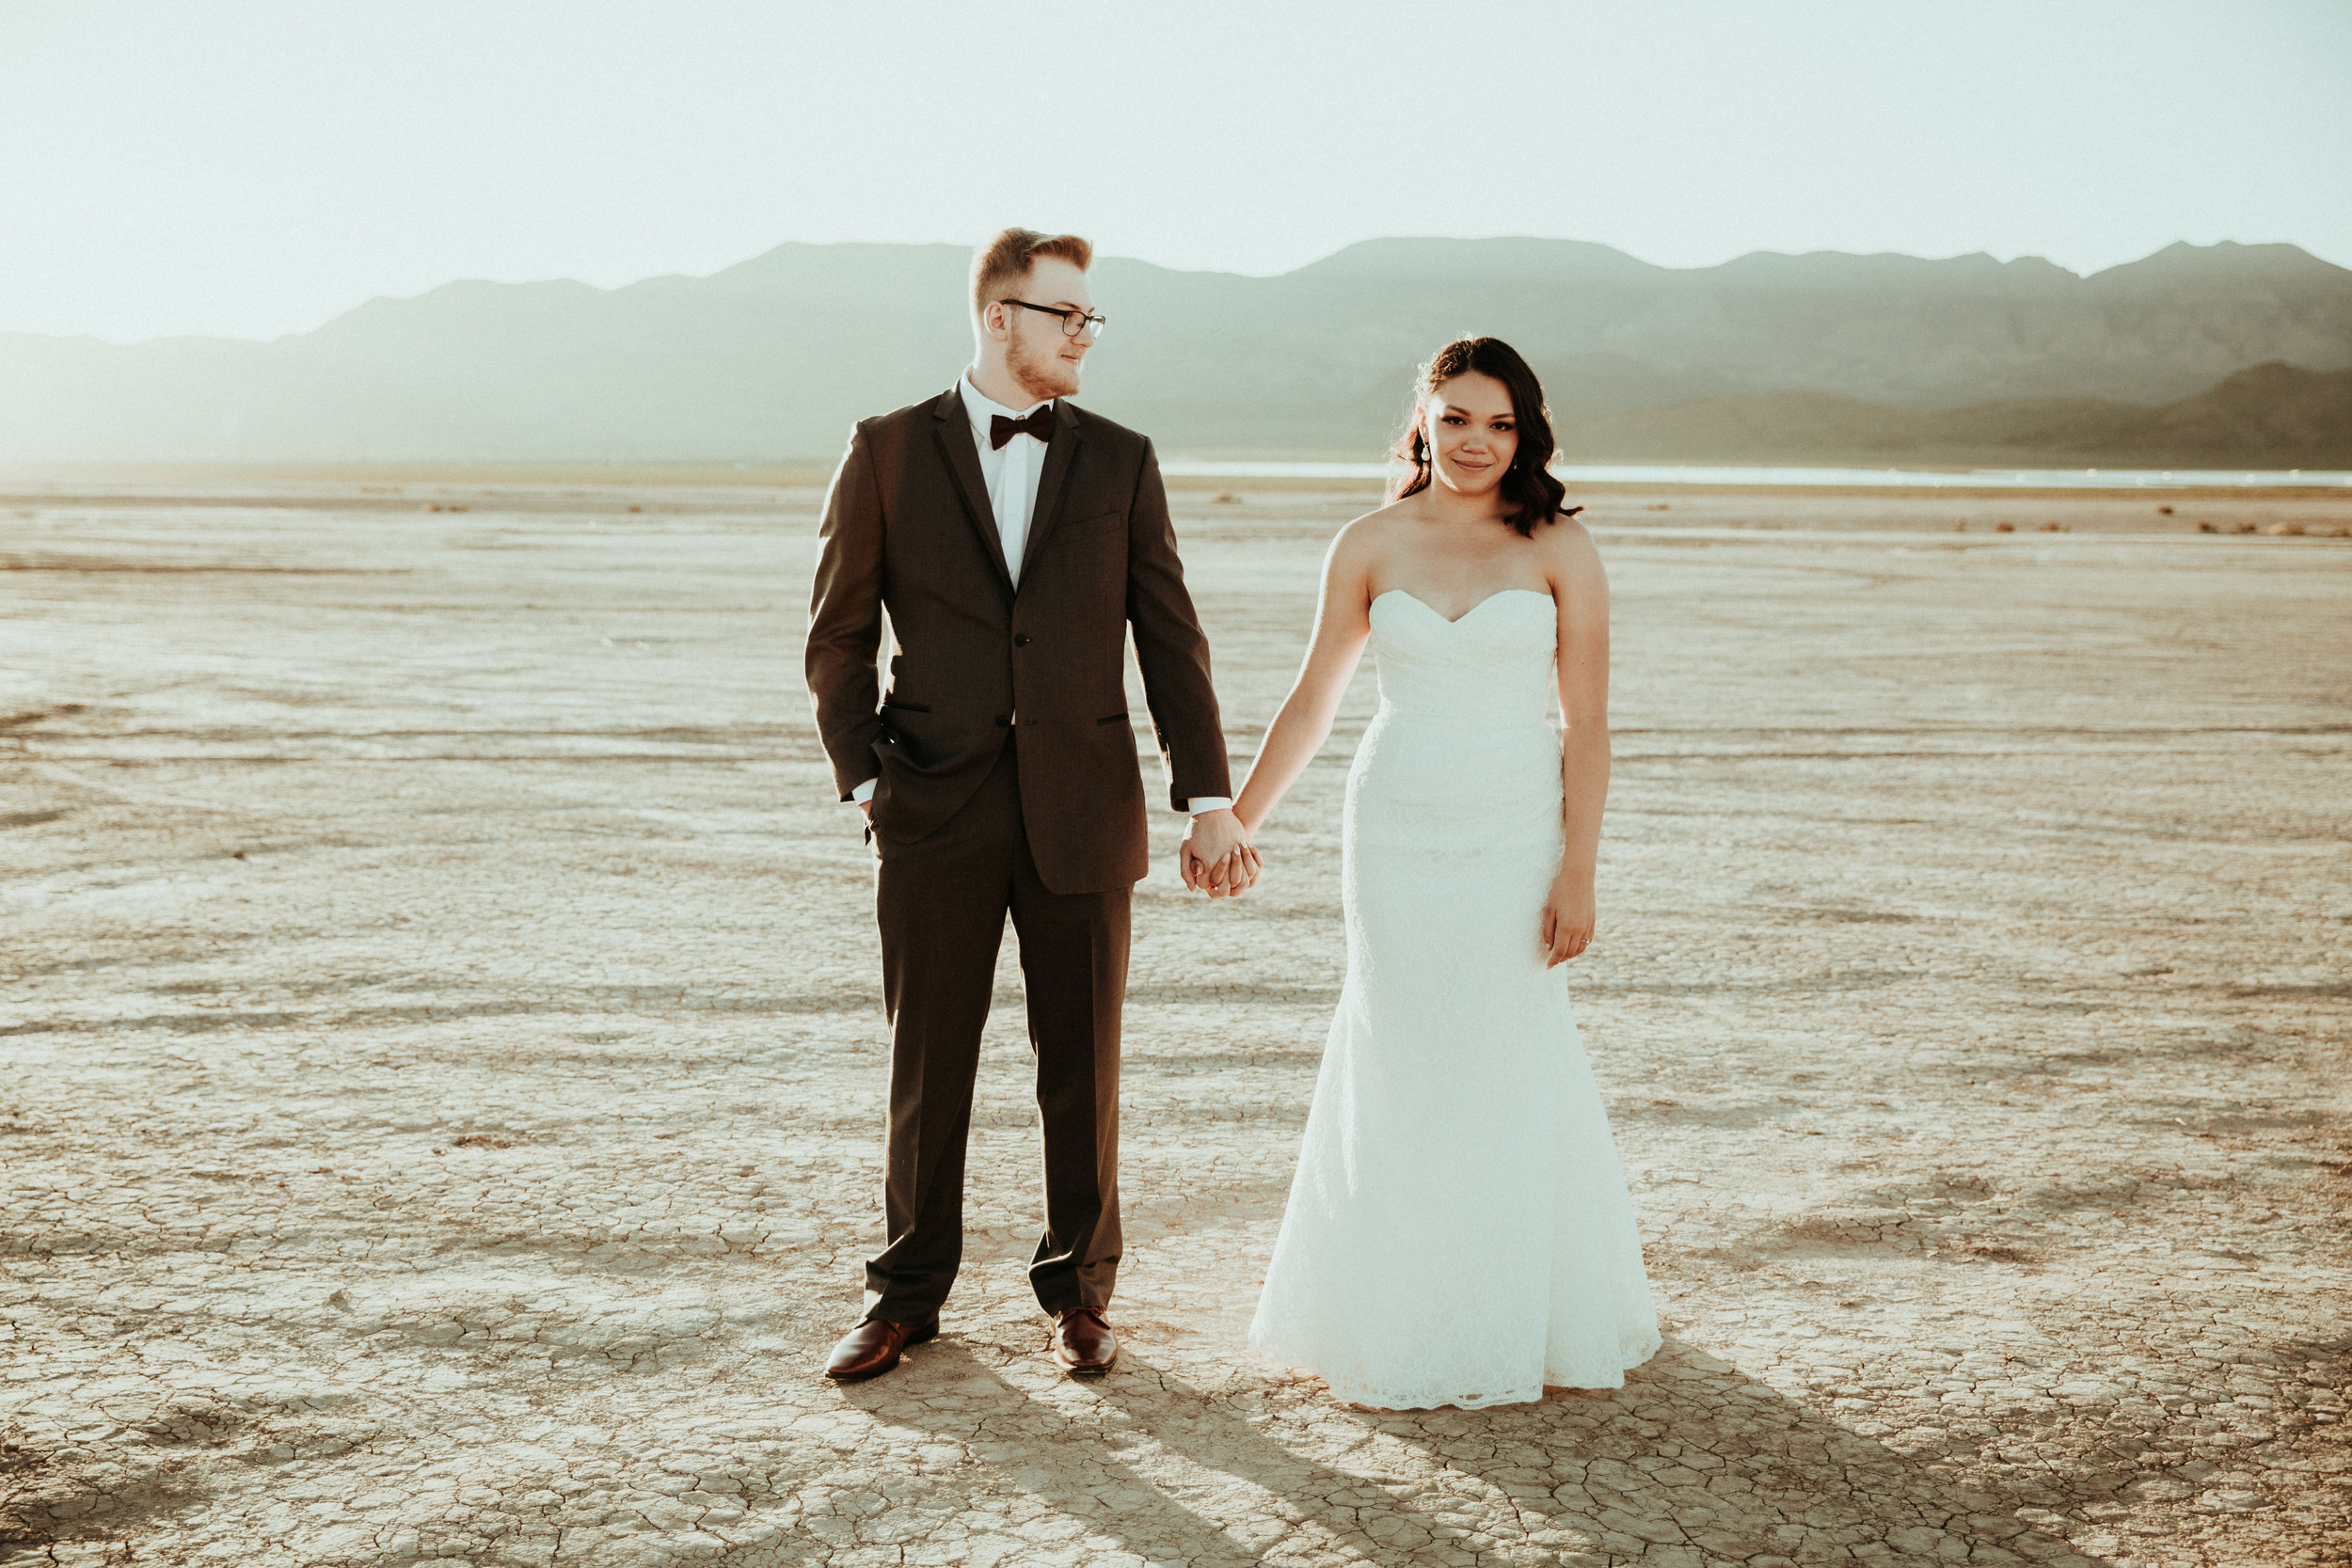 Jessica + Daniel - Seattle Wedding Photographer - Las Vegas Wedding - Henderson, NV - First Look